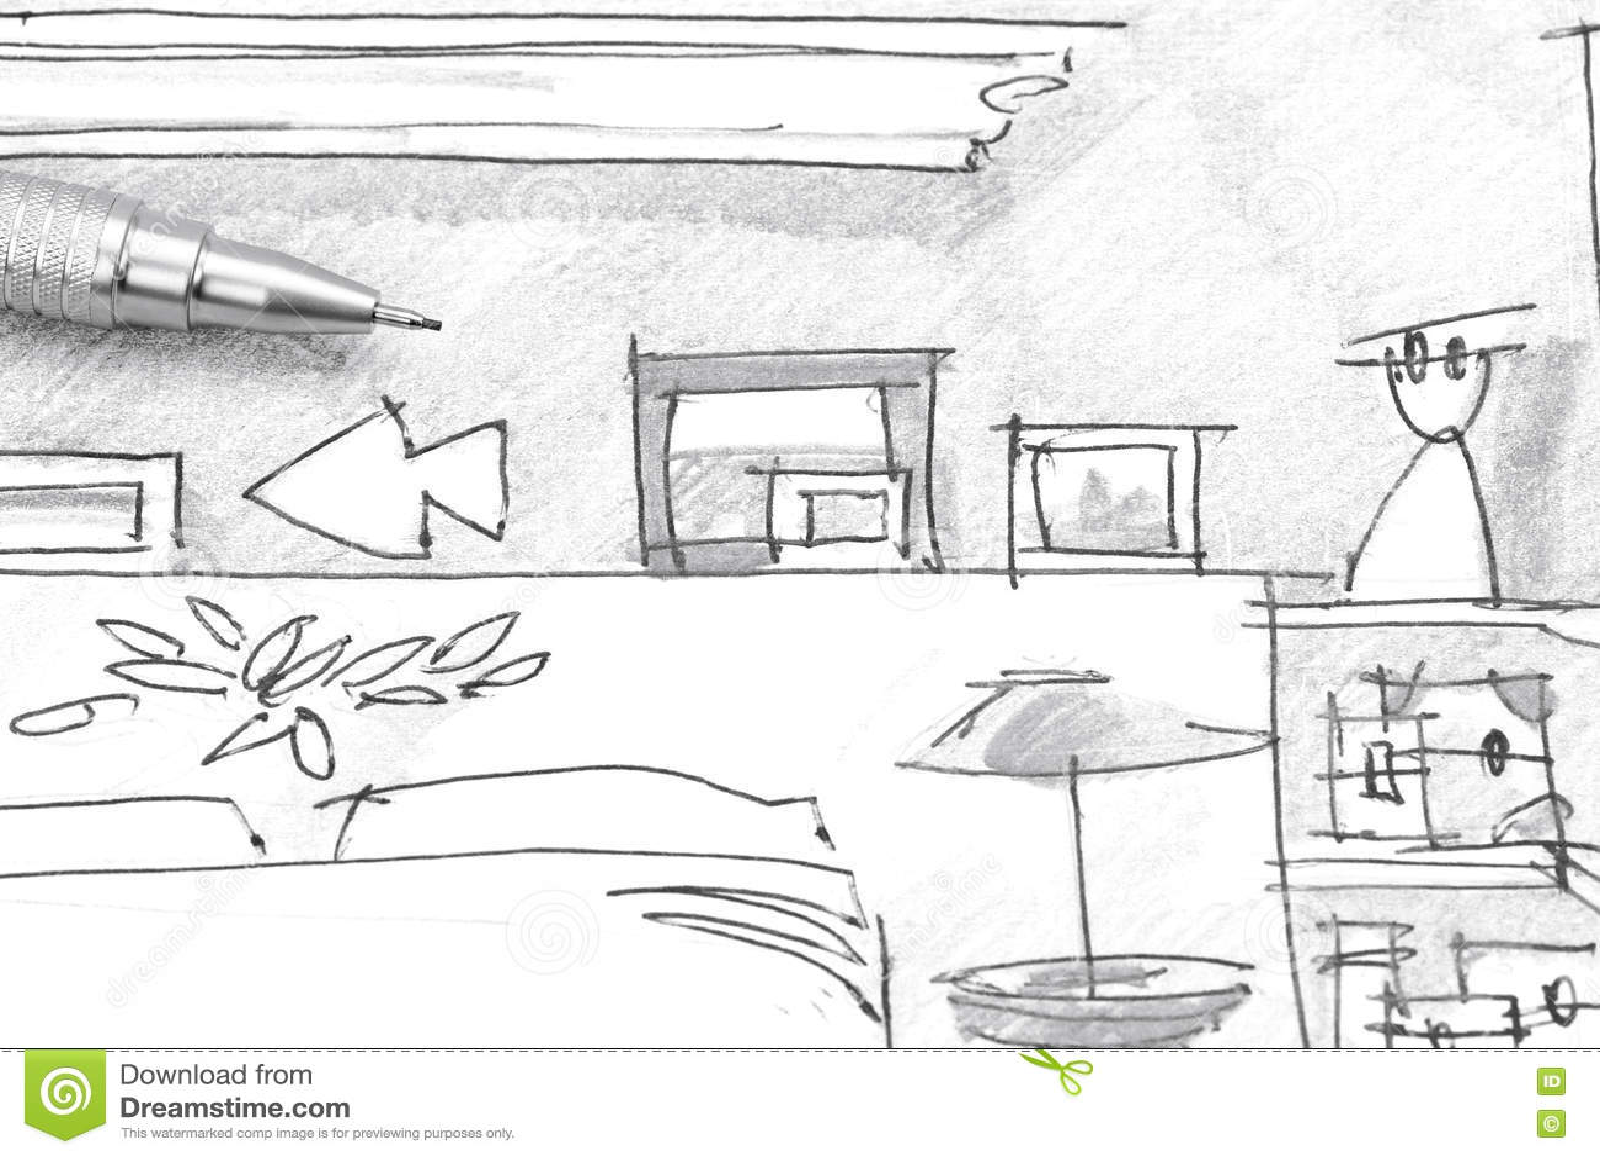 dormitorio dibujo | getpaidforphotos.com - Dibujo De Muebles